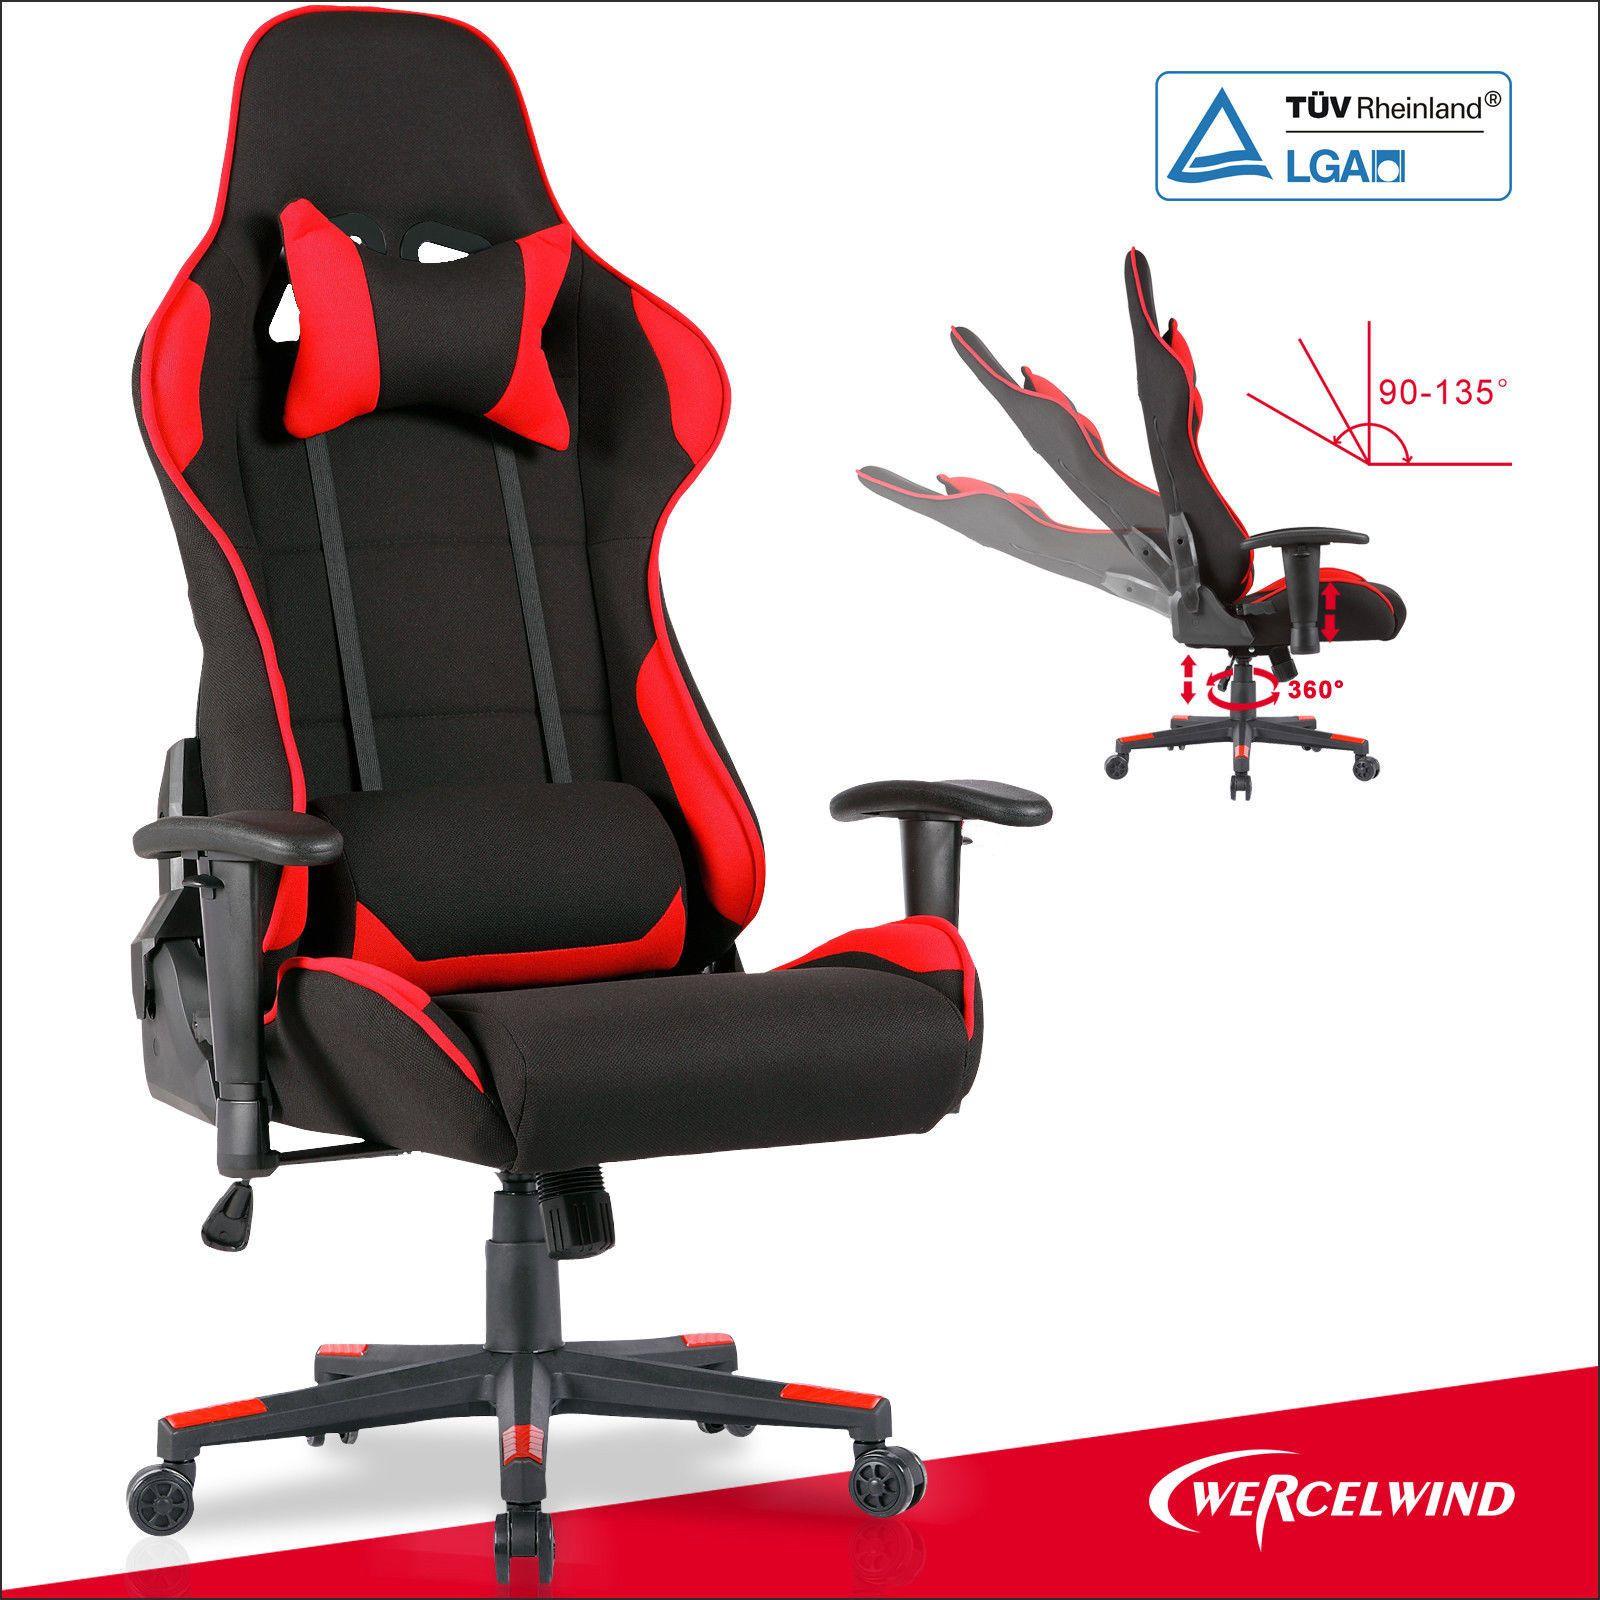 High Back fice Racing Gaming Chair Executive puter Desk Chair Rocker Black